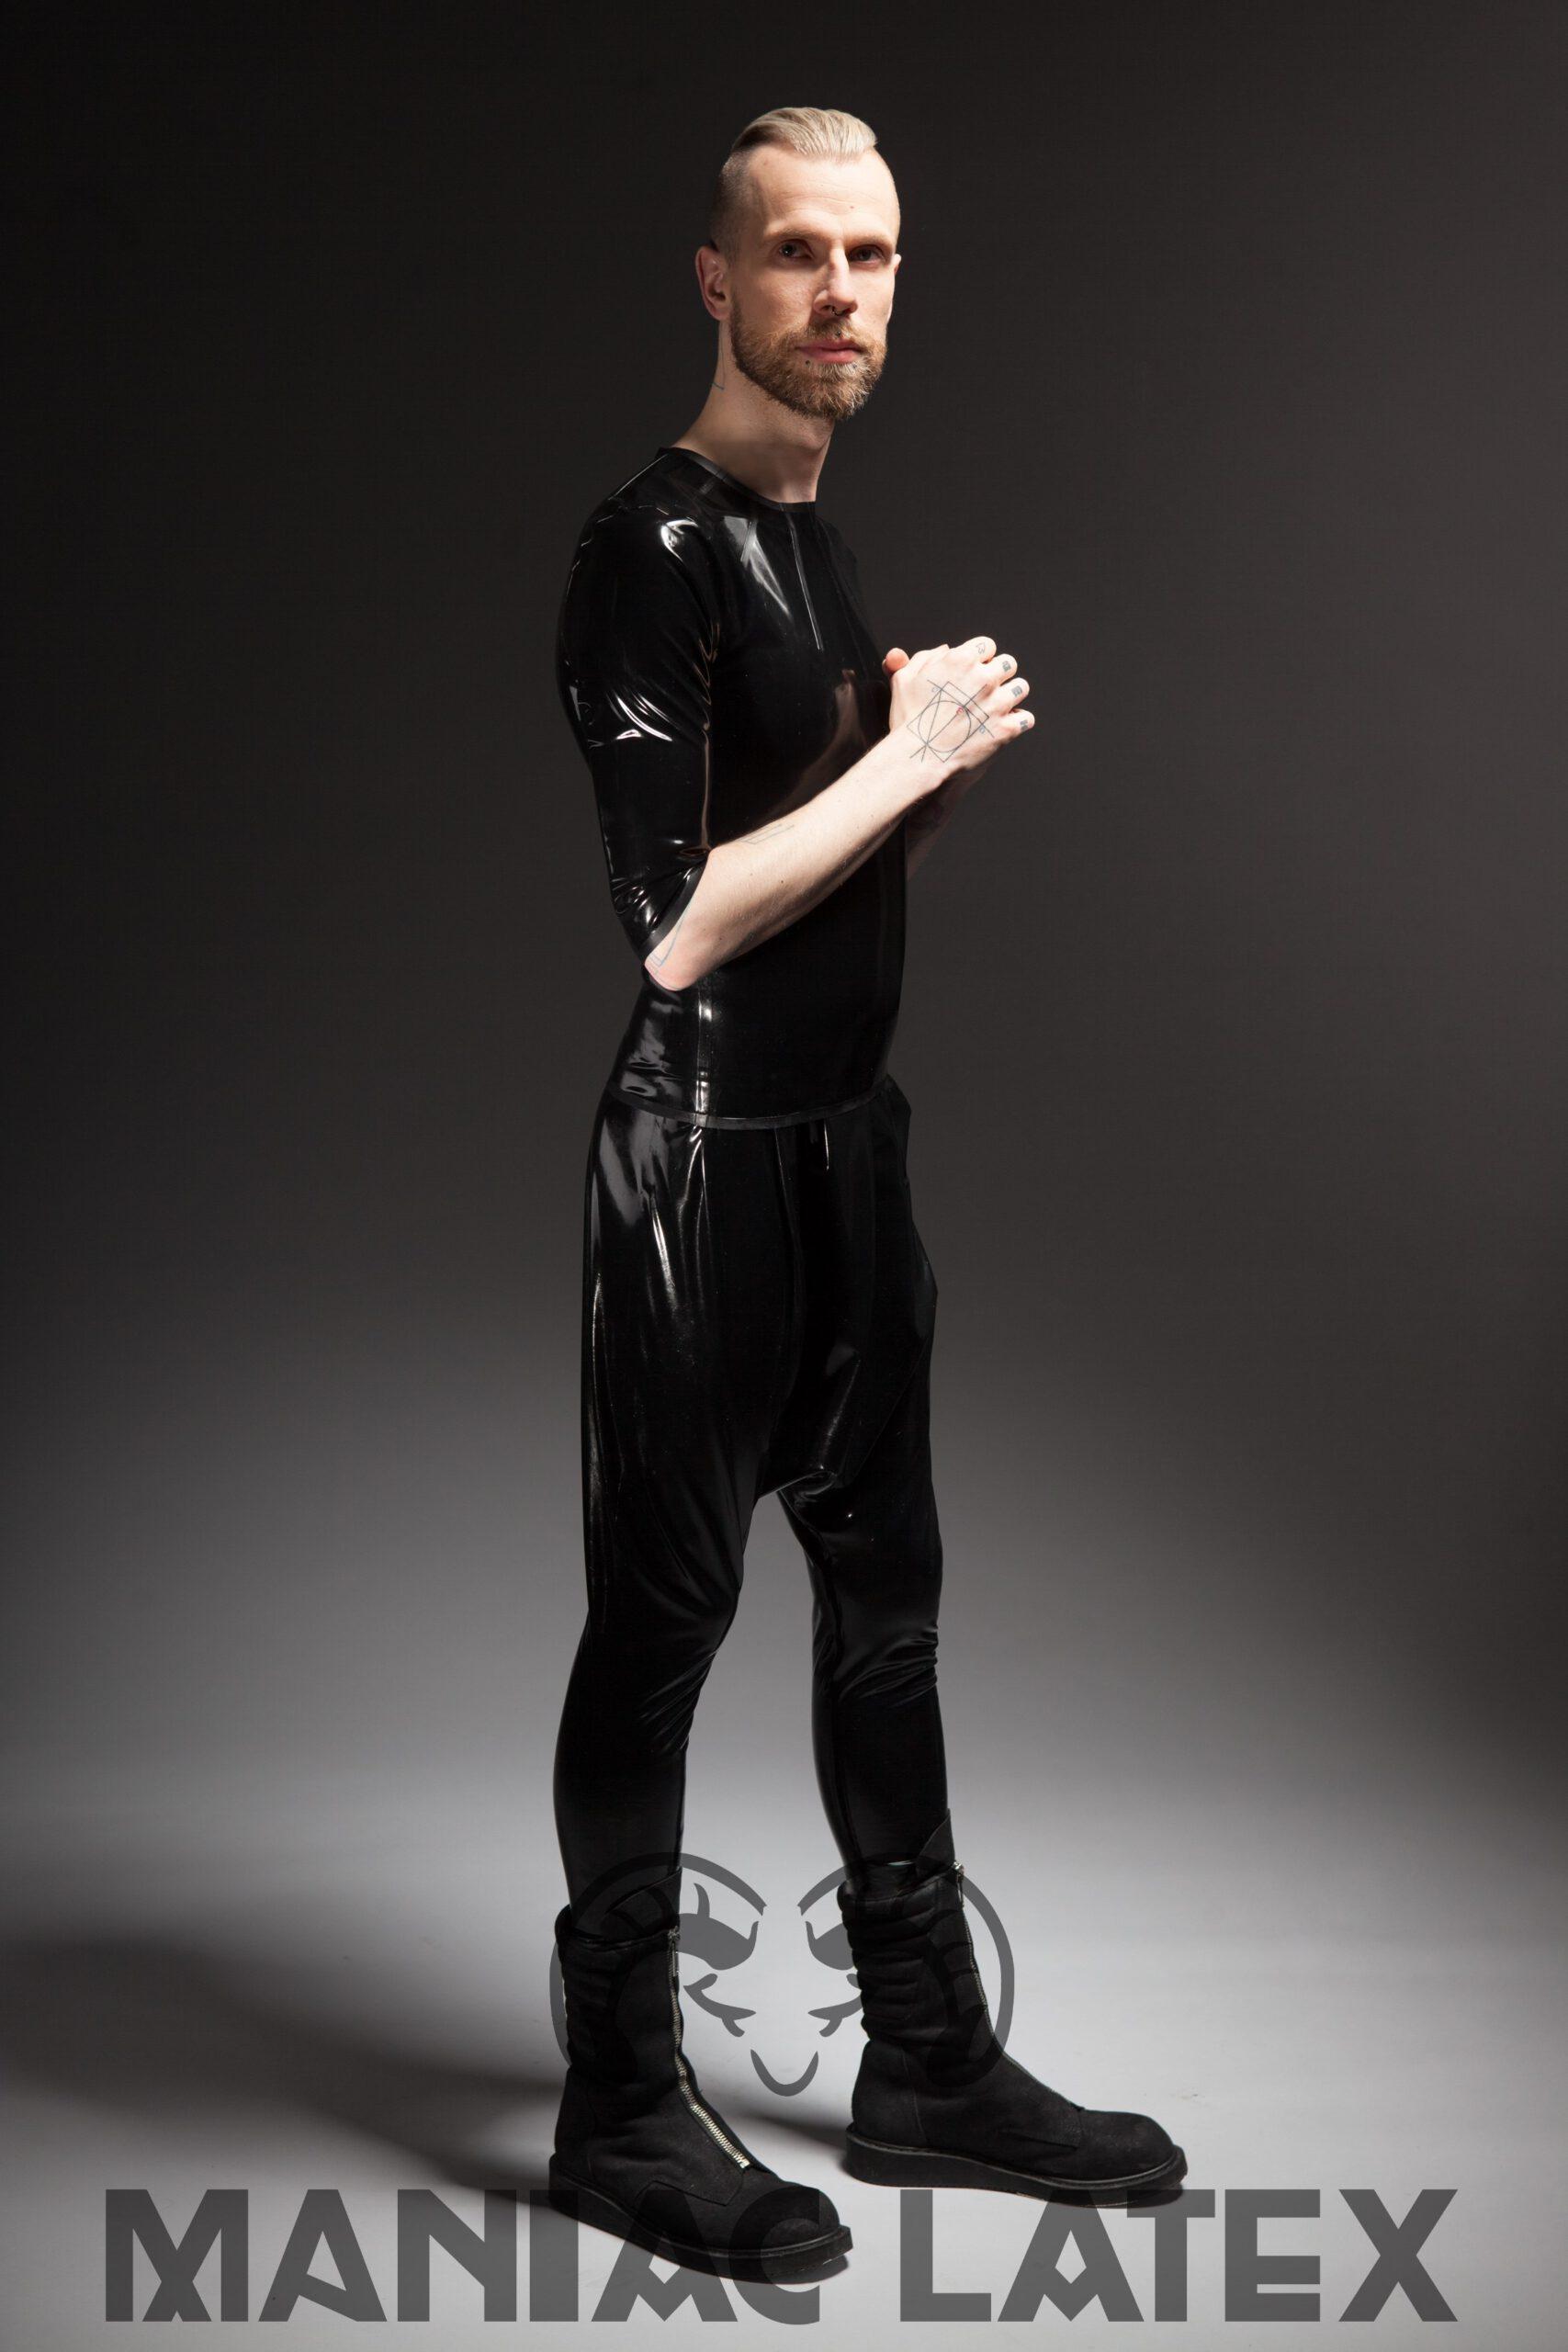 Crotch Pants_The Rising_foto di matti_Maniac Latex